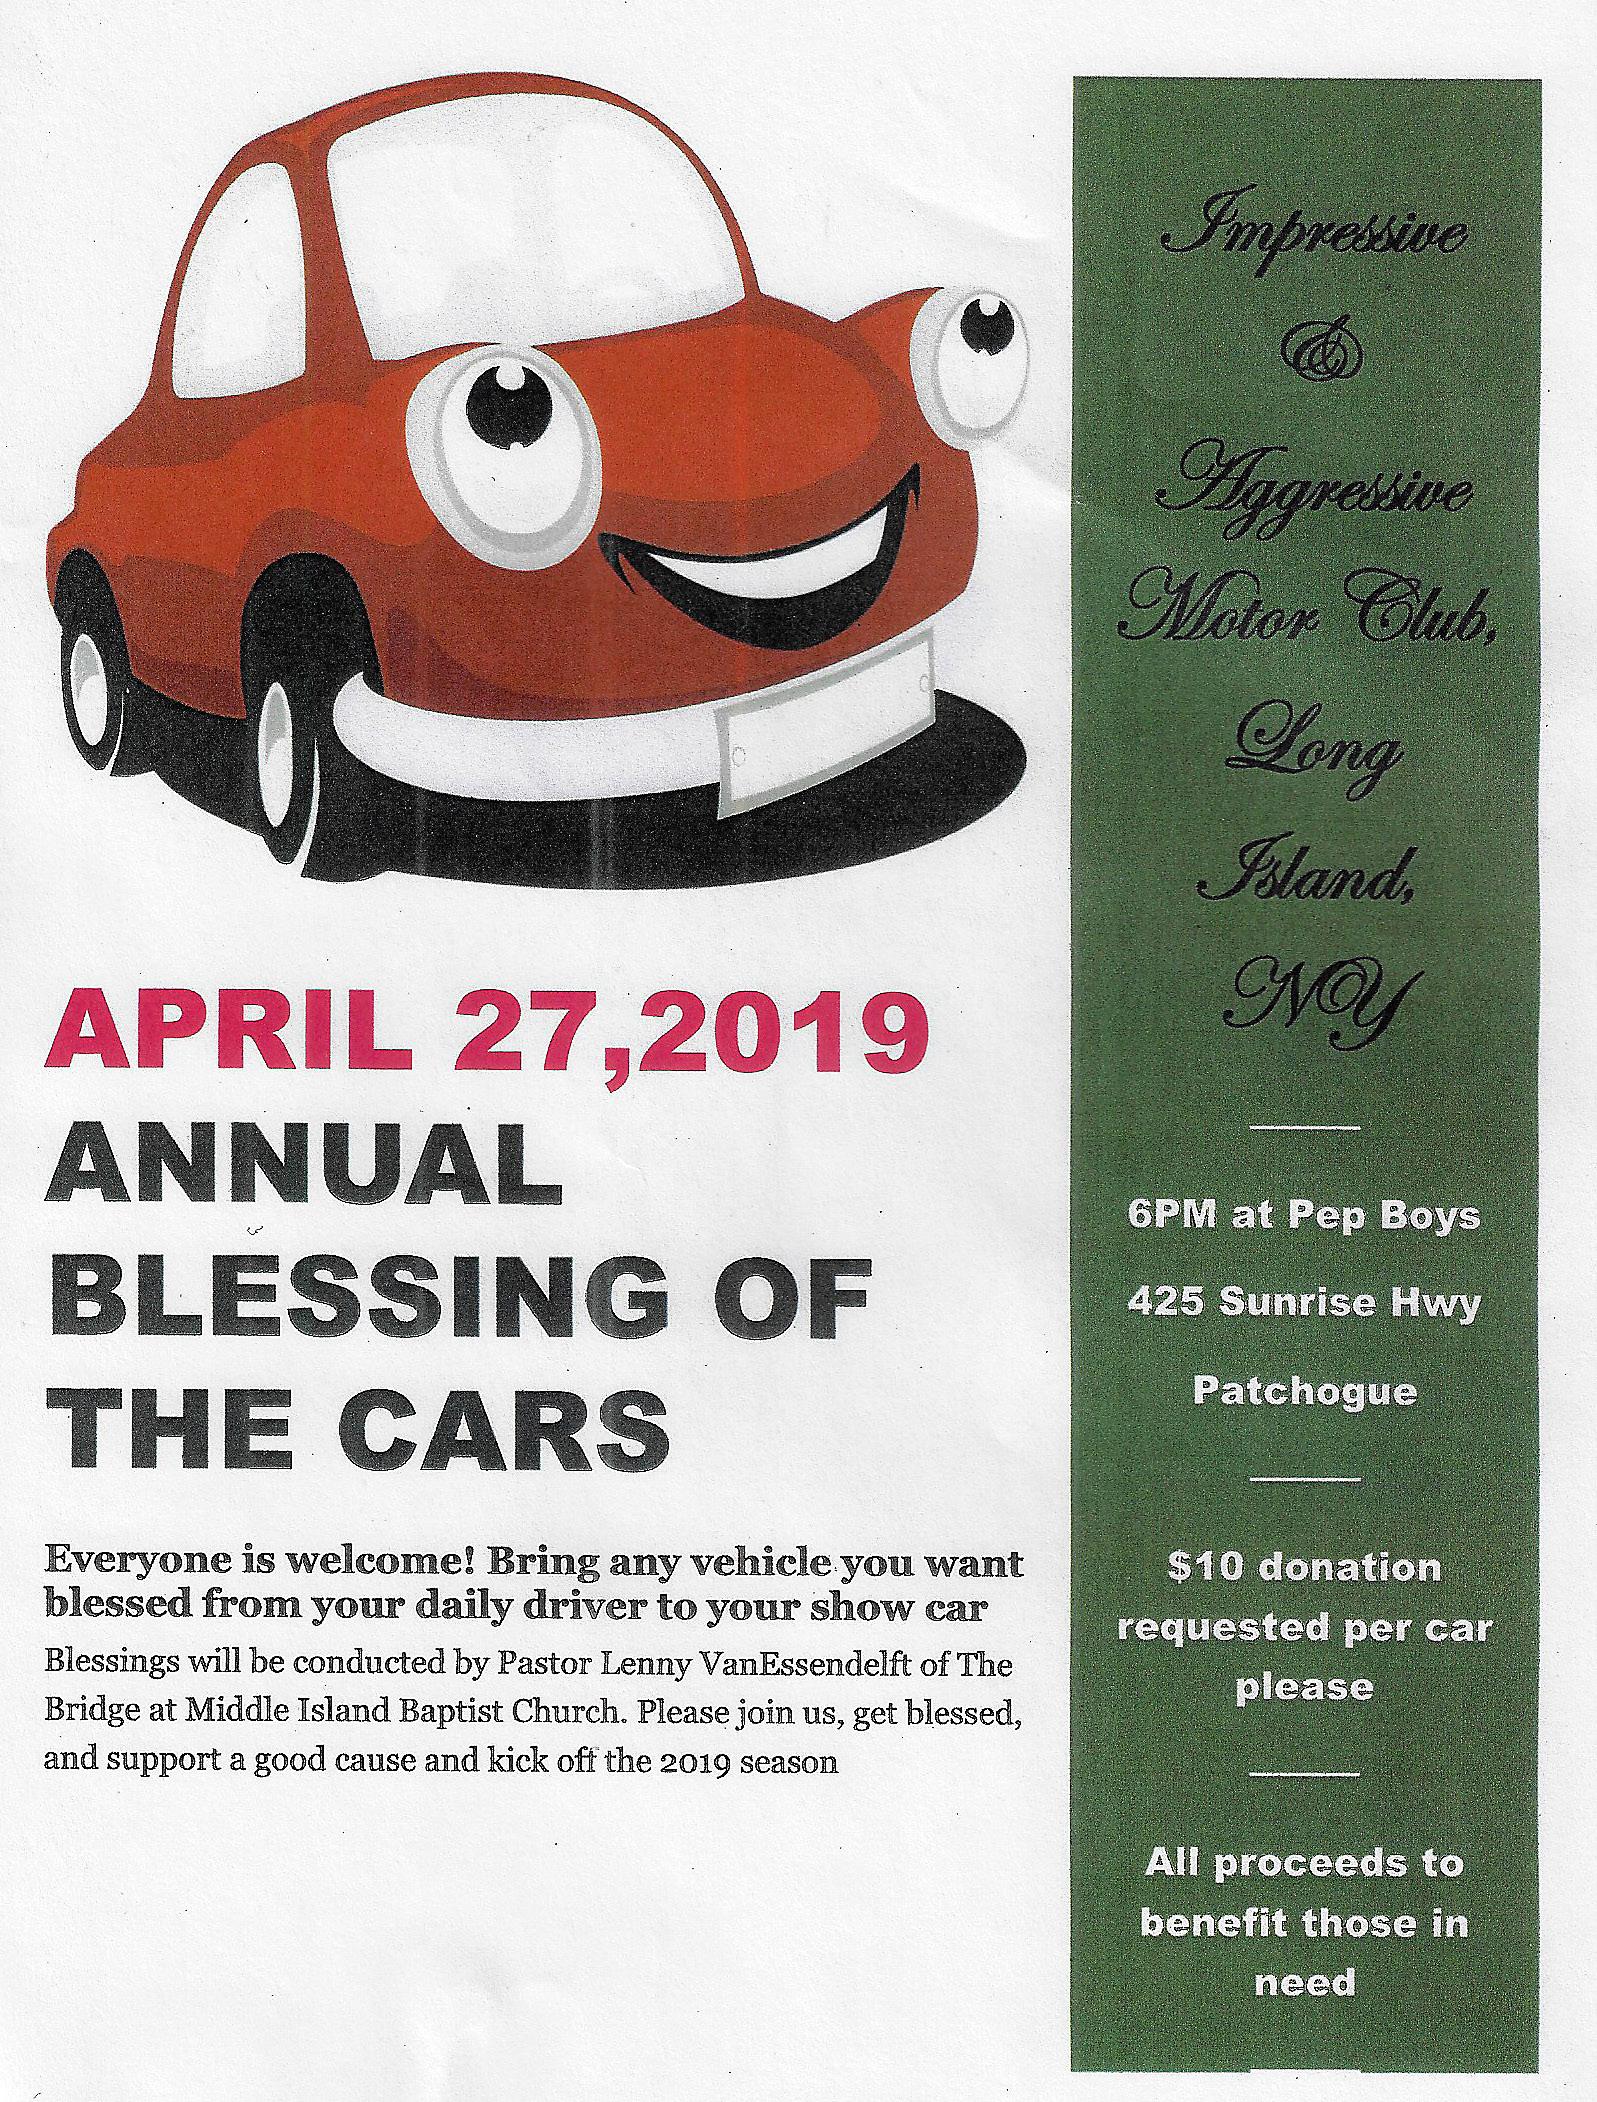 vanderbilt cup races blog long island automotive event calendar for april 2019 updated 4. Black Bedroom Furniture Sets. Home Design Ideas